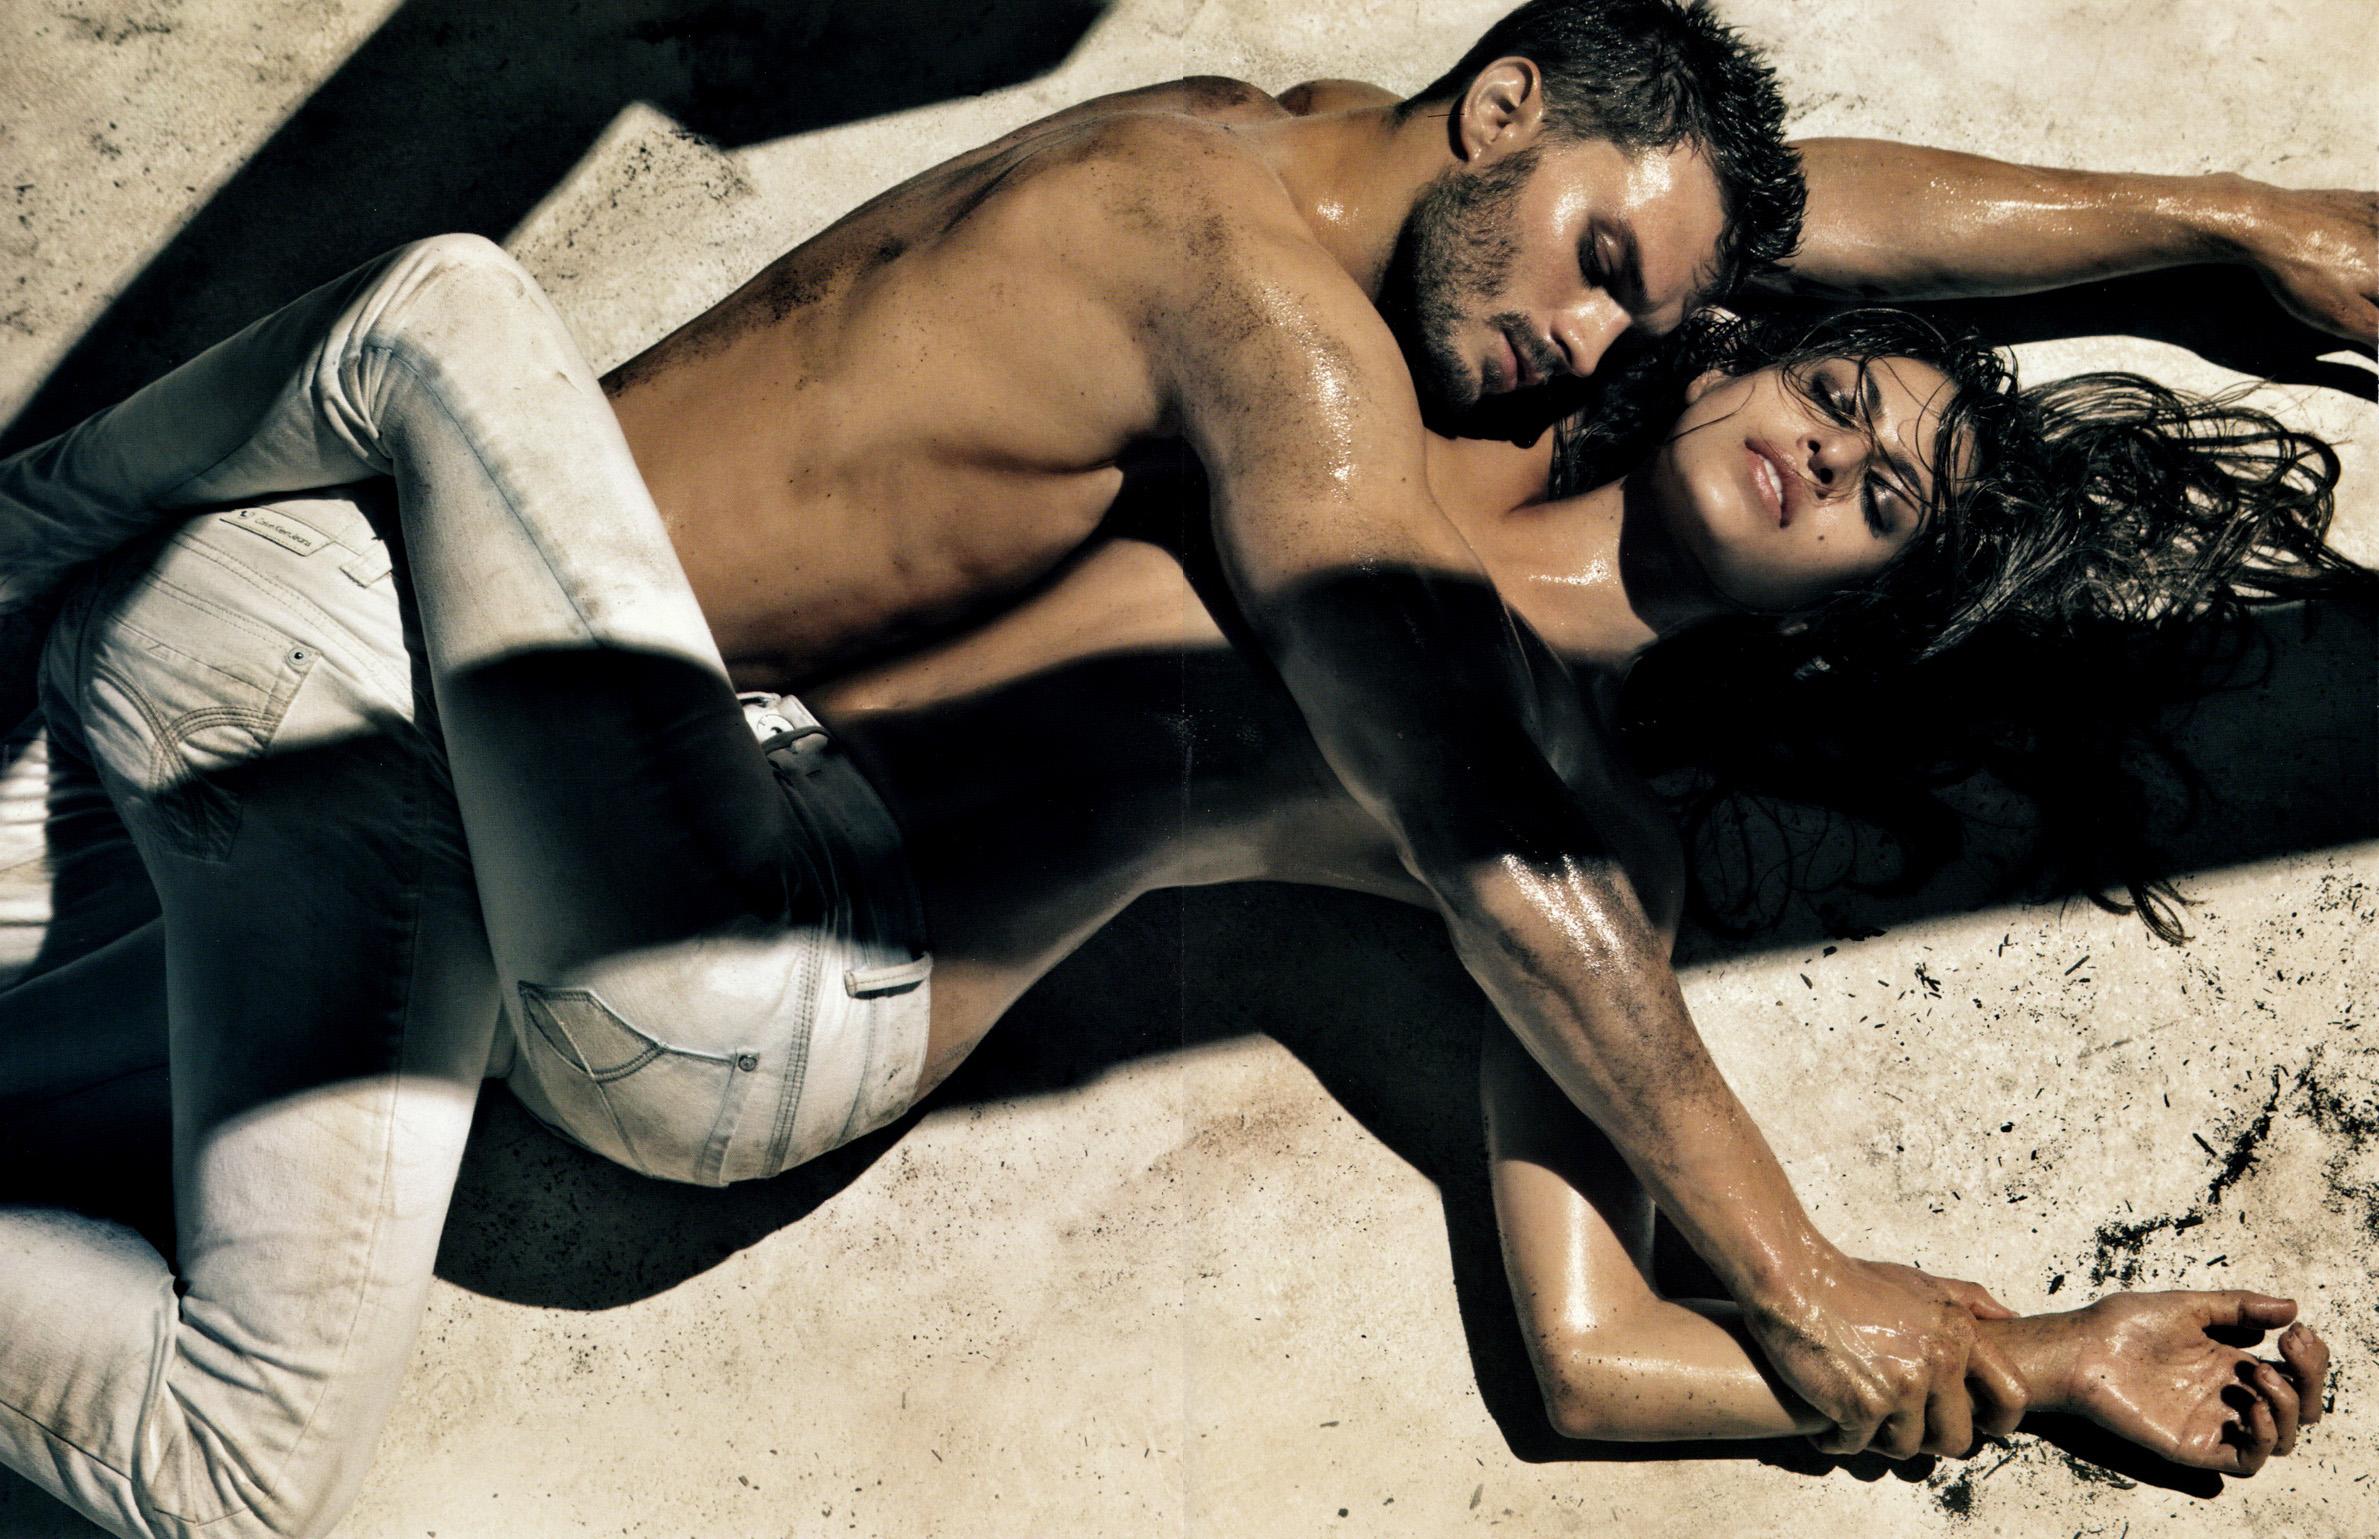 Секс в кампания фото 17 фотография